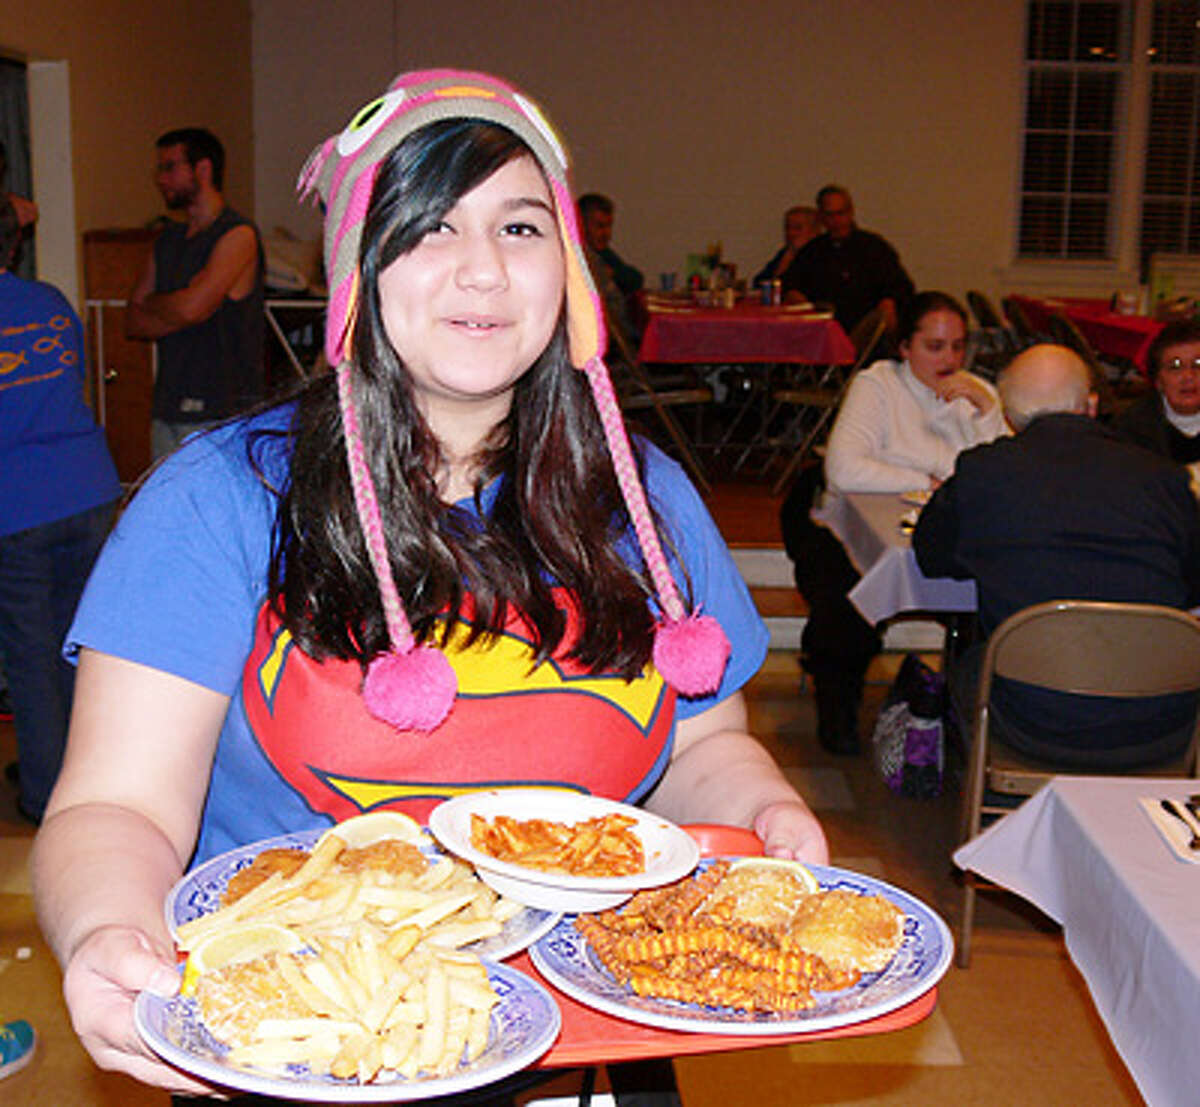 Ximenita Varas volunteers as a meal server during a past Lenten Fish Fry at United Methodist..